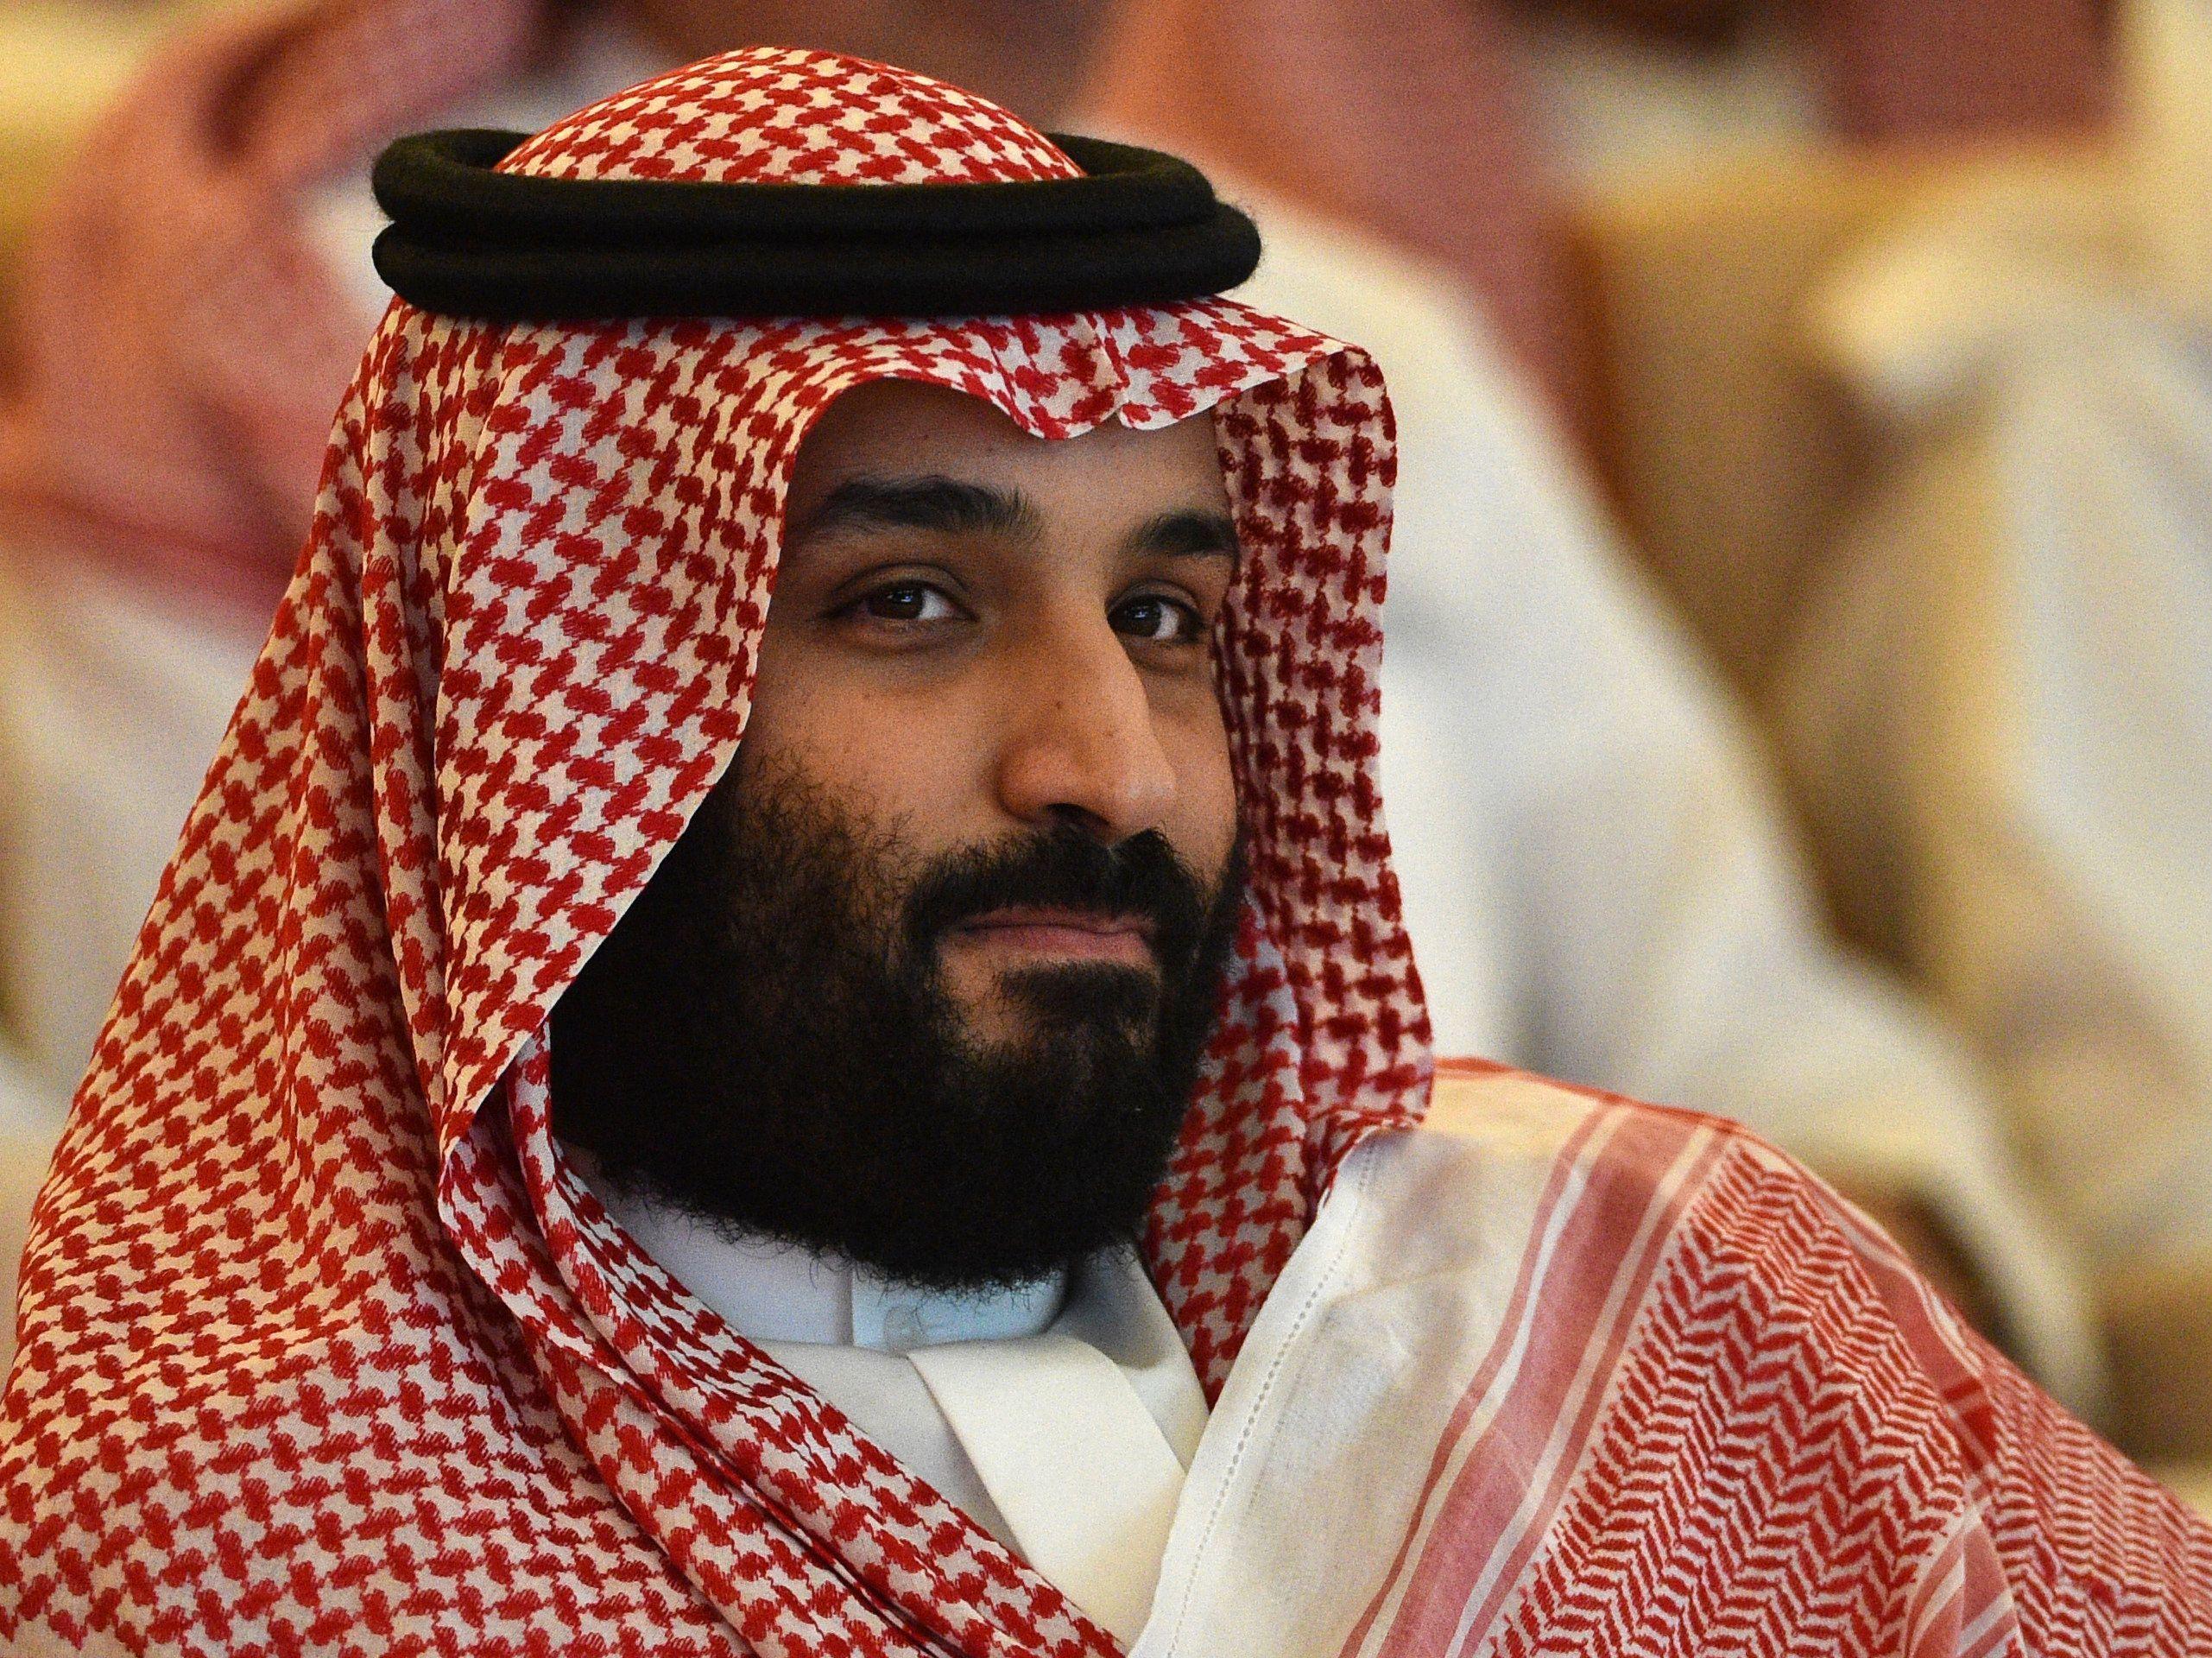 Khashoggi murder 'happened under my watch,' Saudi crown prince tells PBS